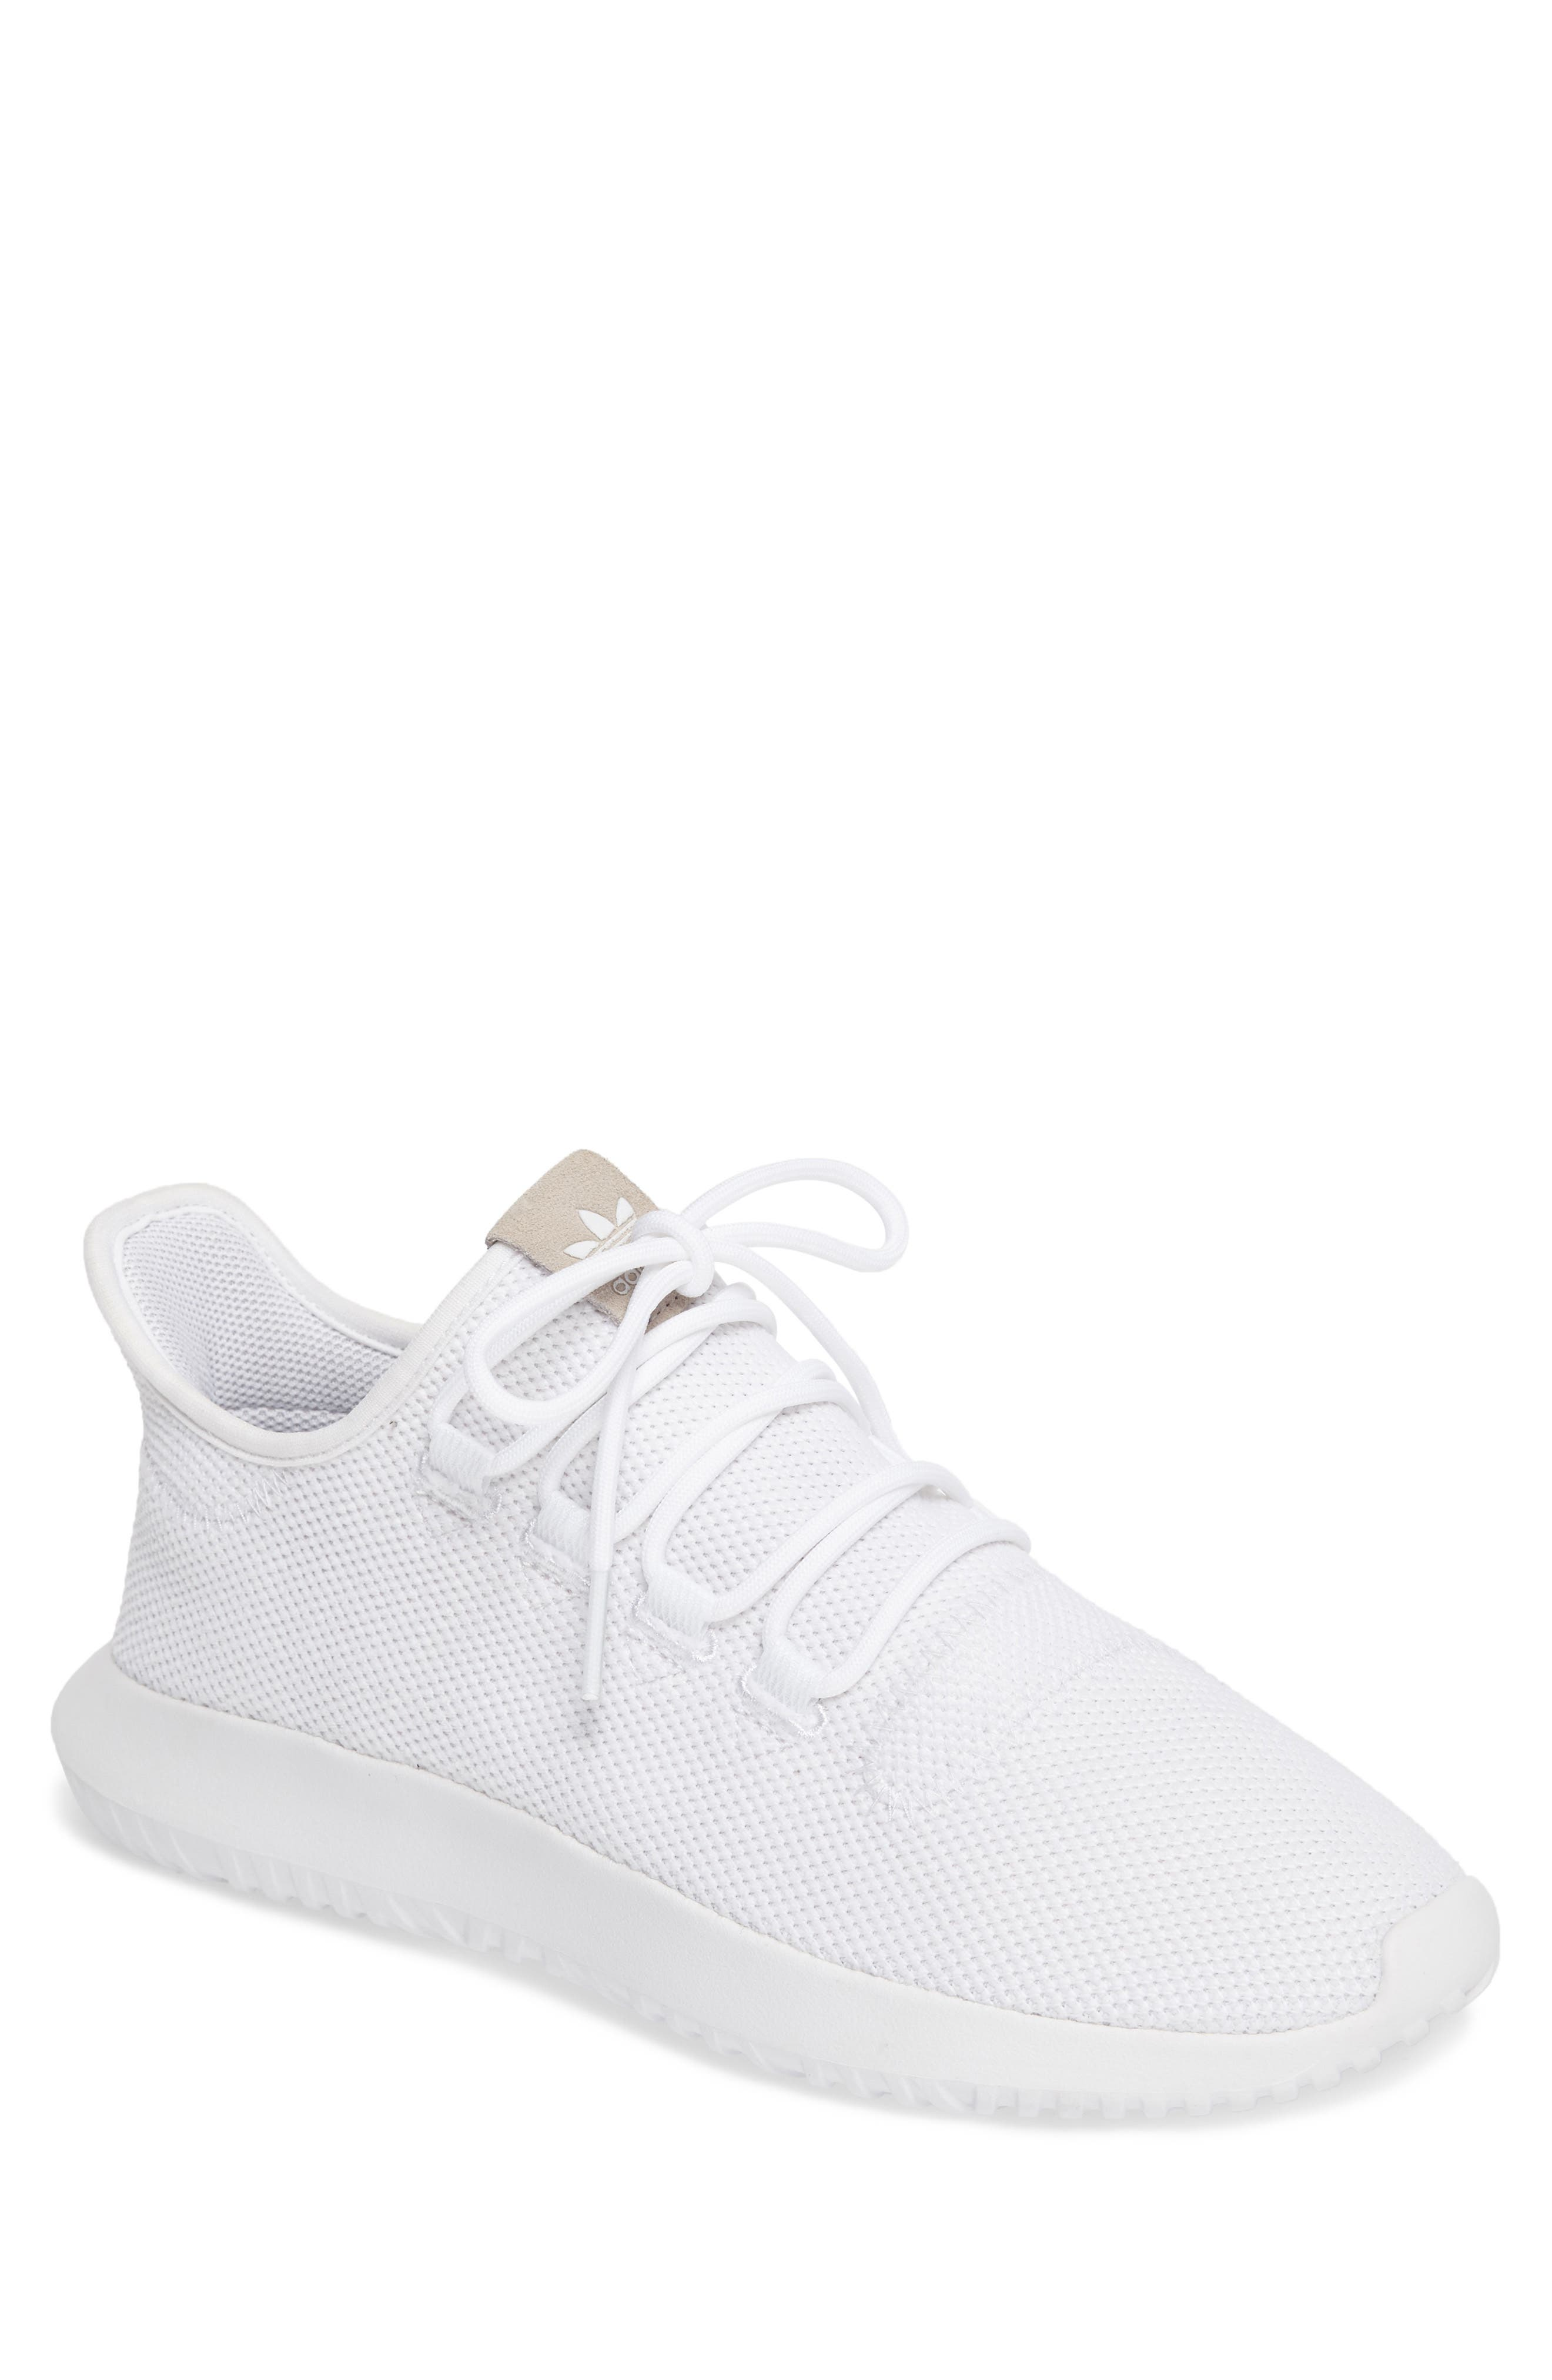 Alternate Image 1 Selected - adidas Tubular Shadow Sneaker (Men)